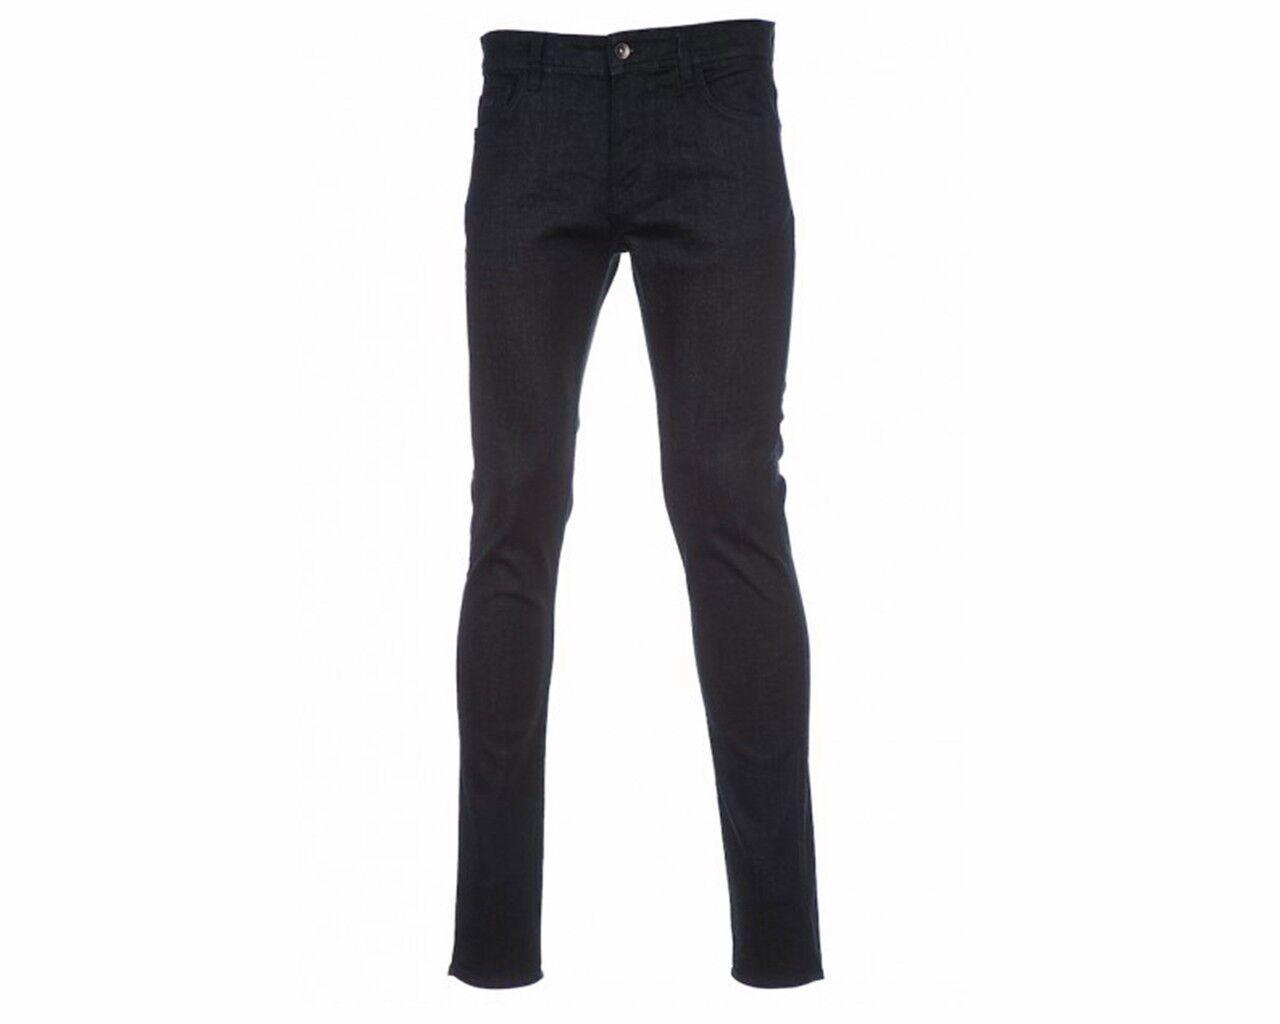 Ausverkauf Hugo Boss grün Miami 2 50338850 50338850 50338850 Extra Slim Fit Jeans dunkelblau afb058